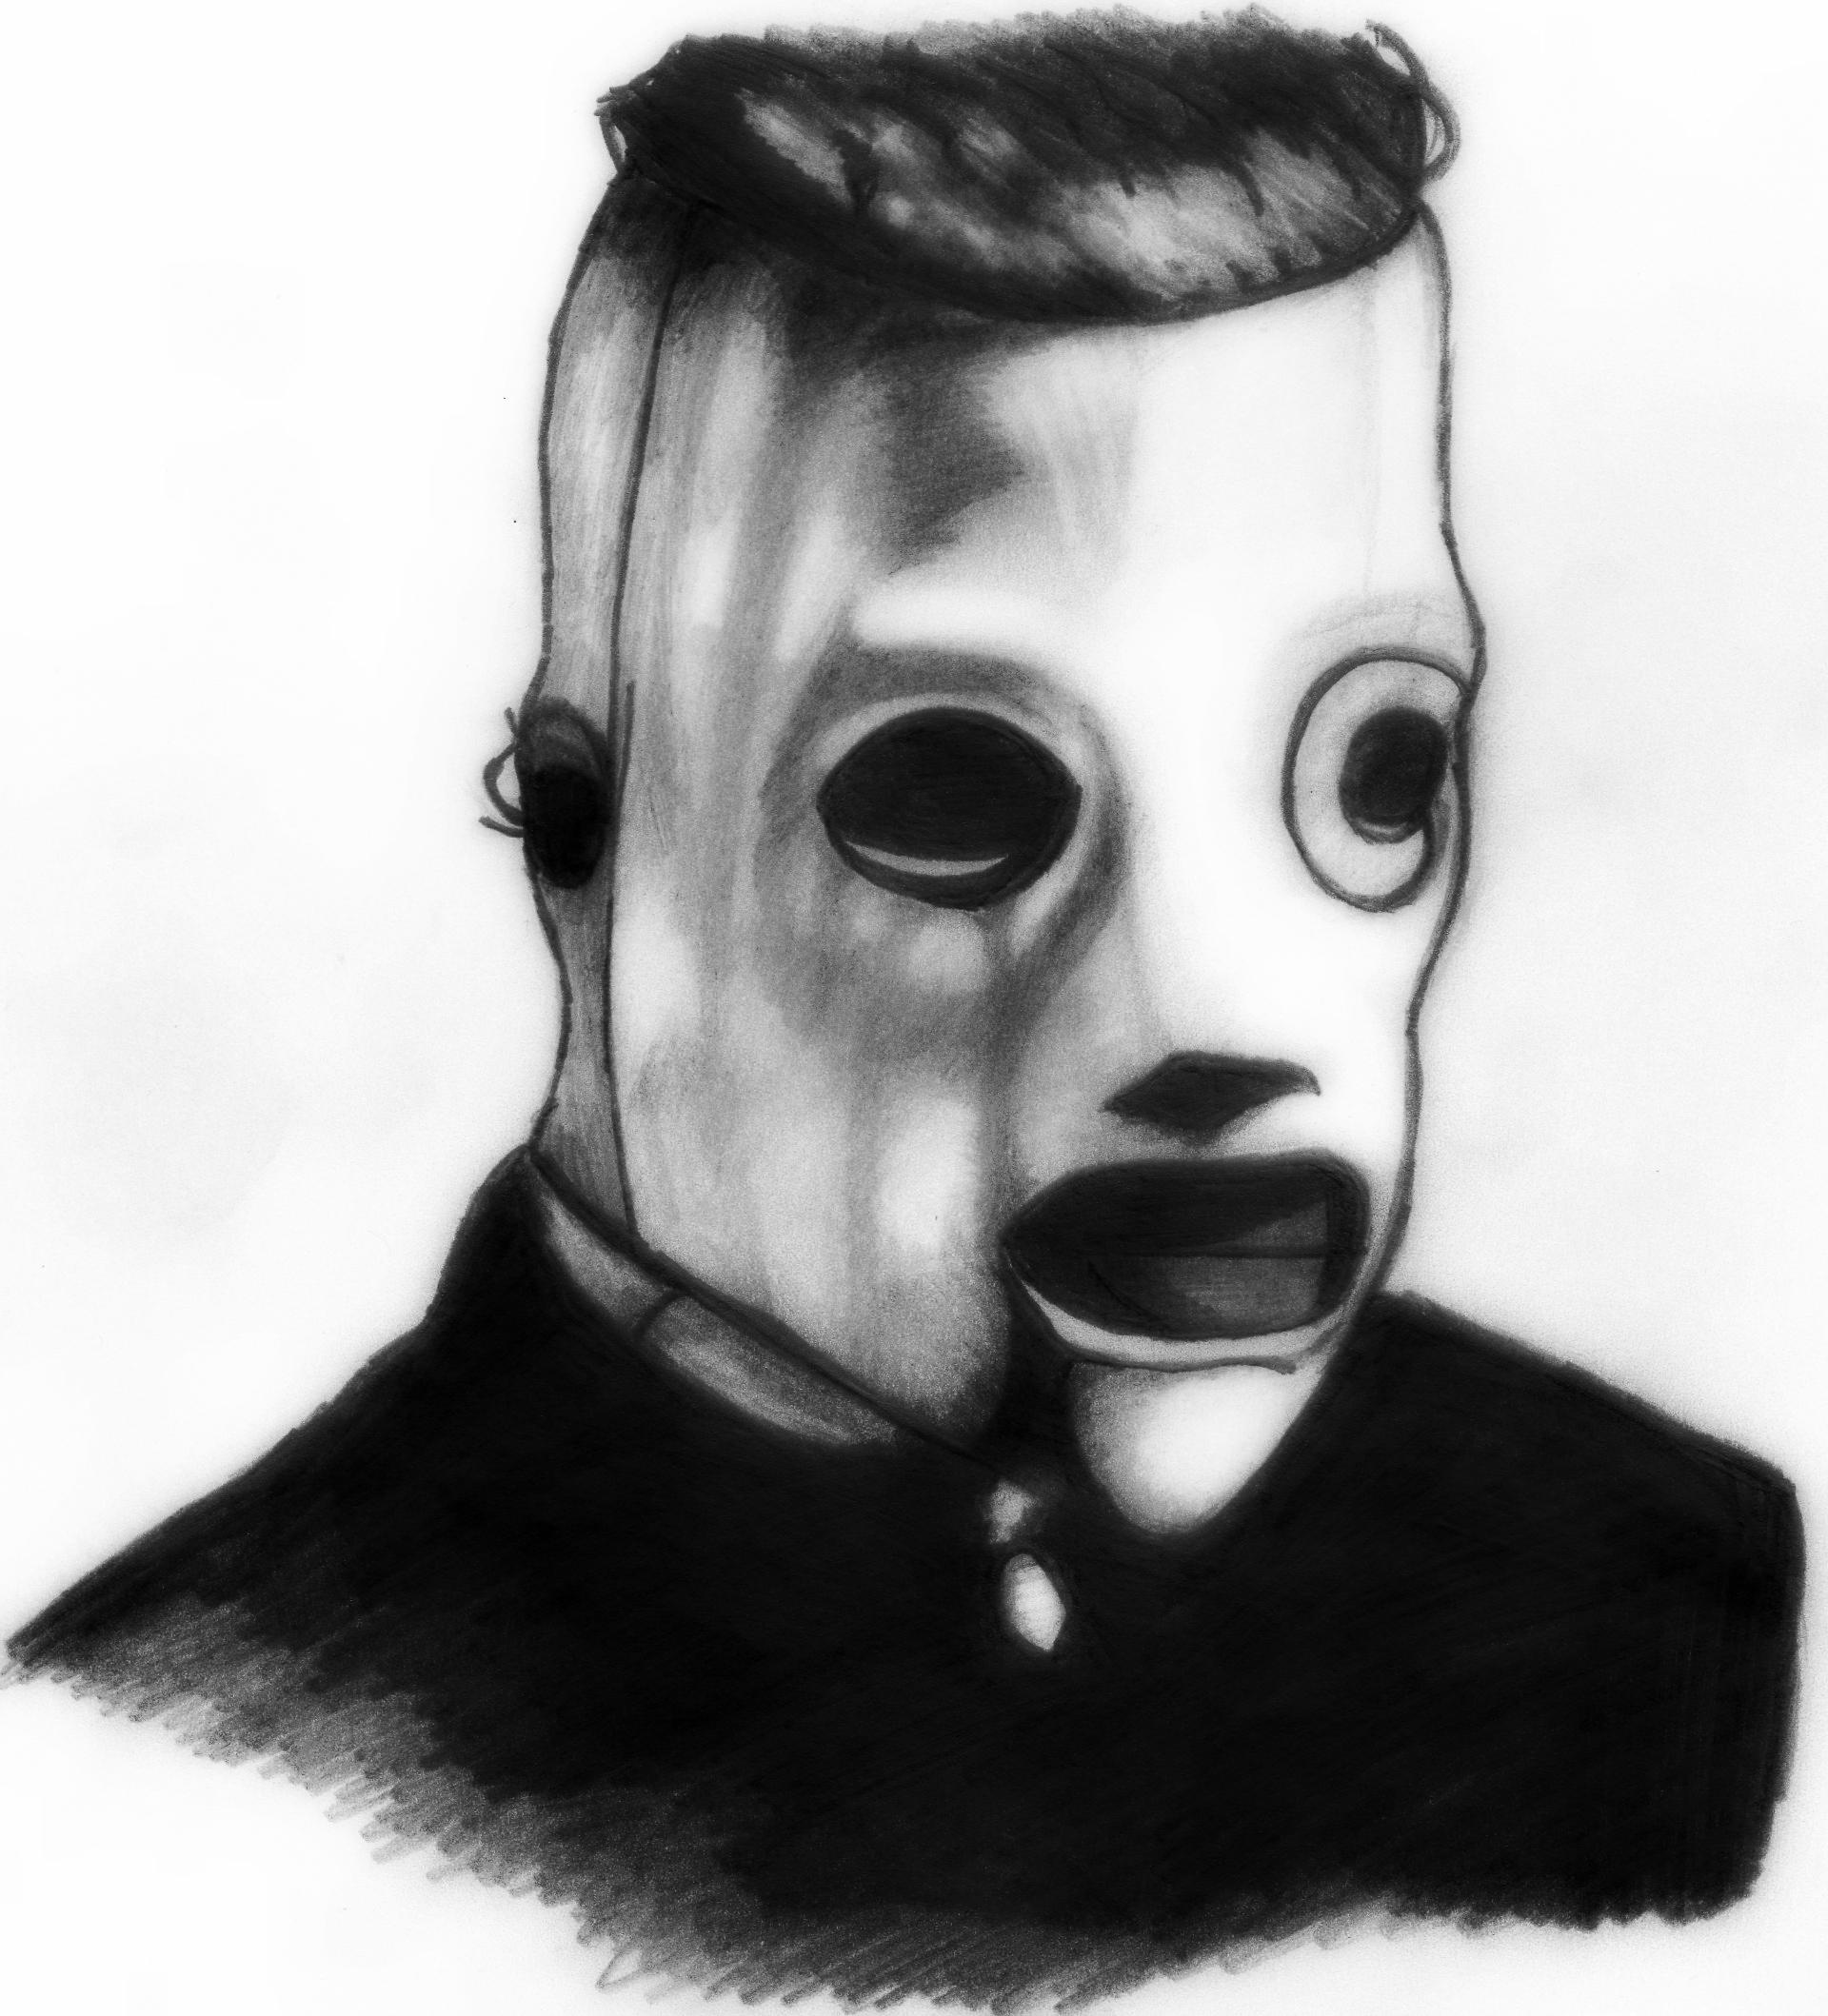 slipknot corey taylor drawing by deathlouis on deviantart